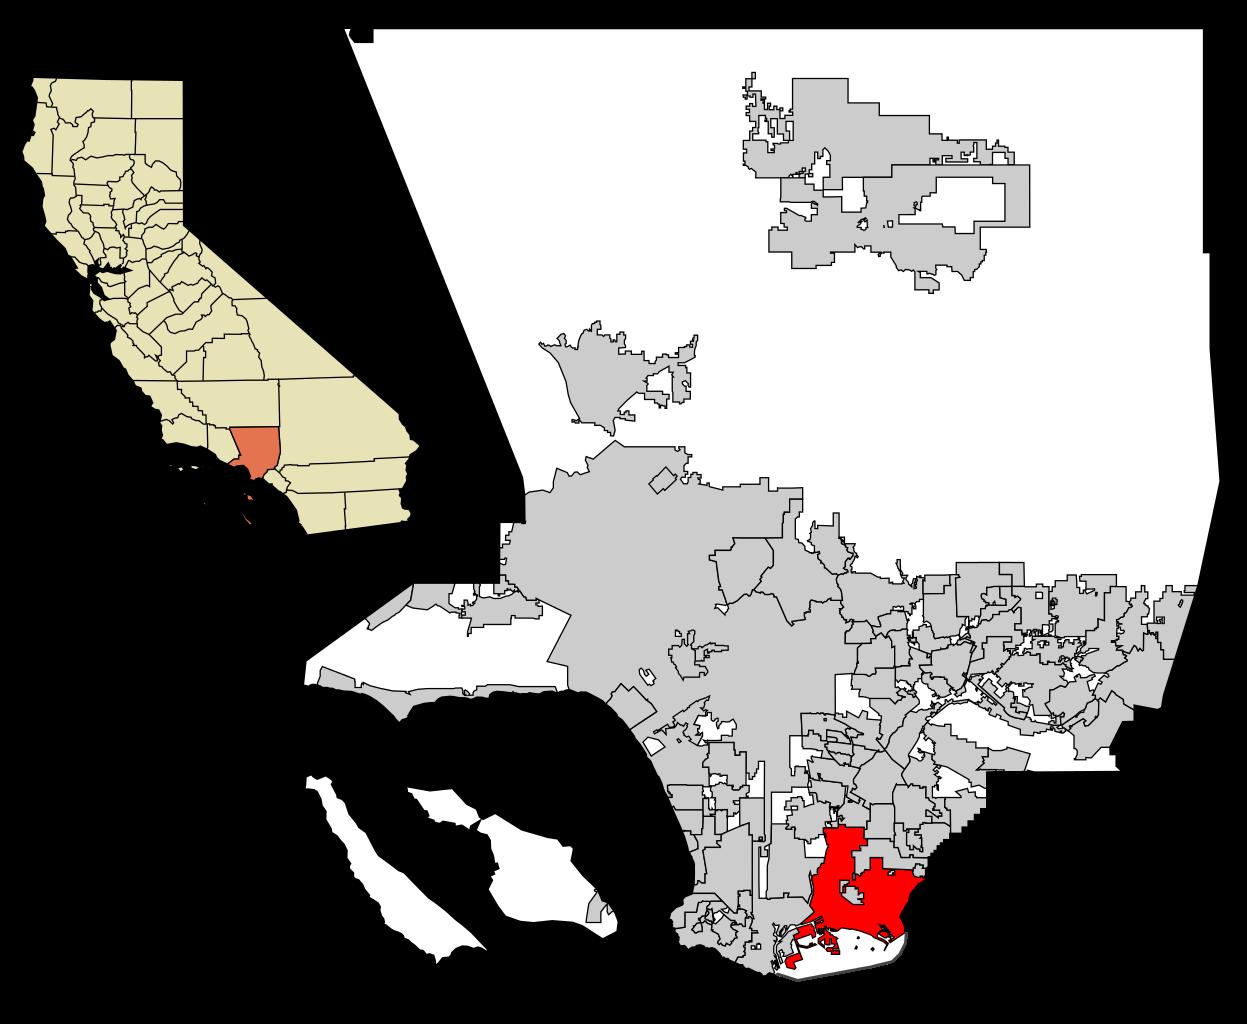 File:CAMap-doton-Long Beach.PNG - Wikimedia Commons